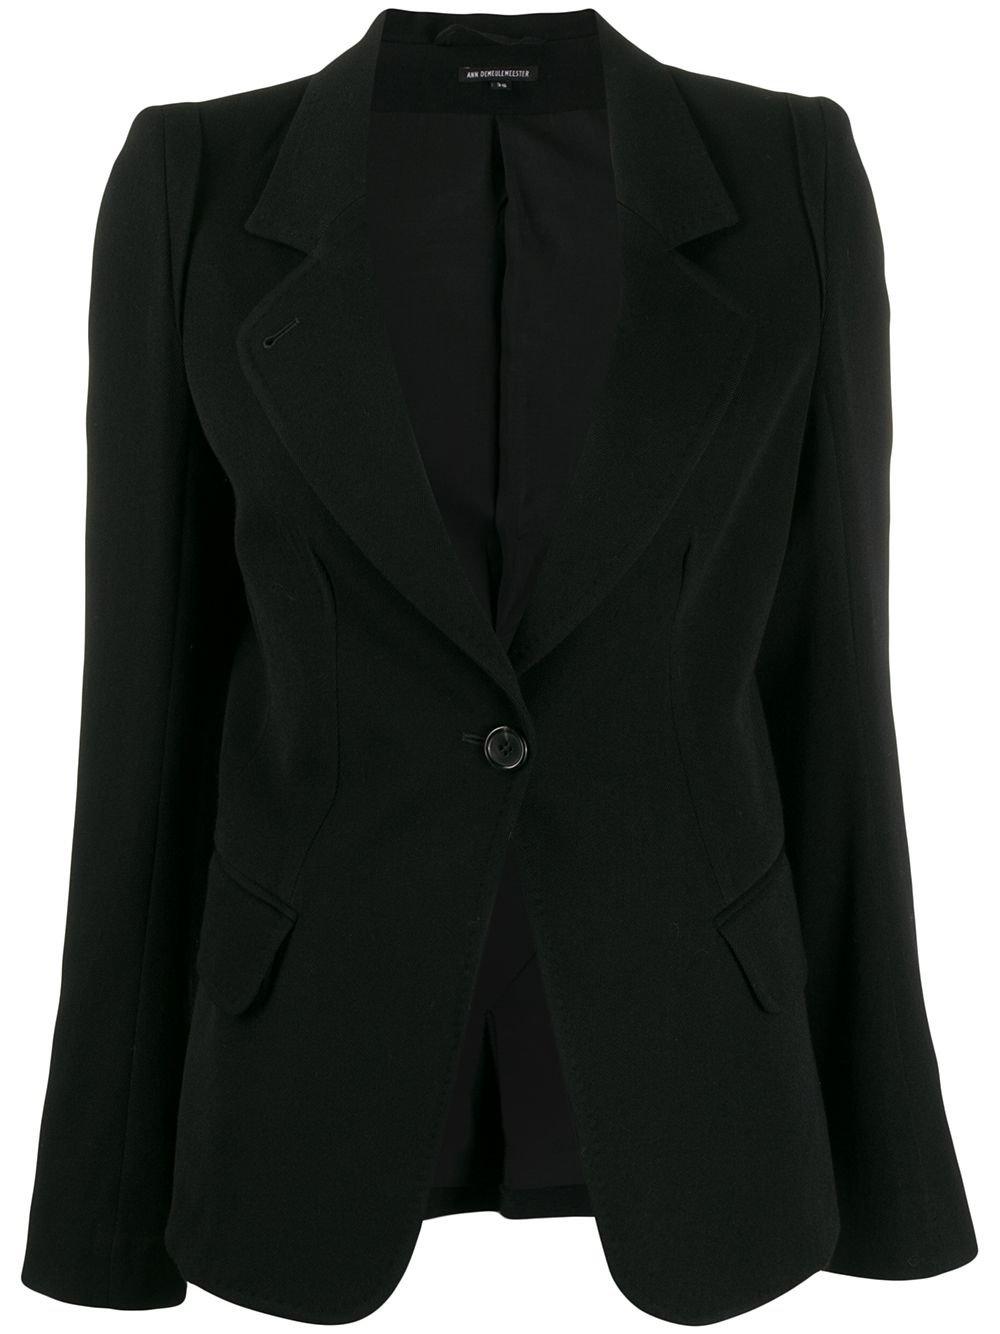 Black Ann Demeulemeester Single-Breasted Fitted Blazer   Farfetch.com